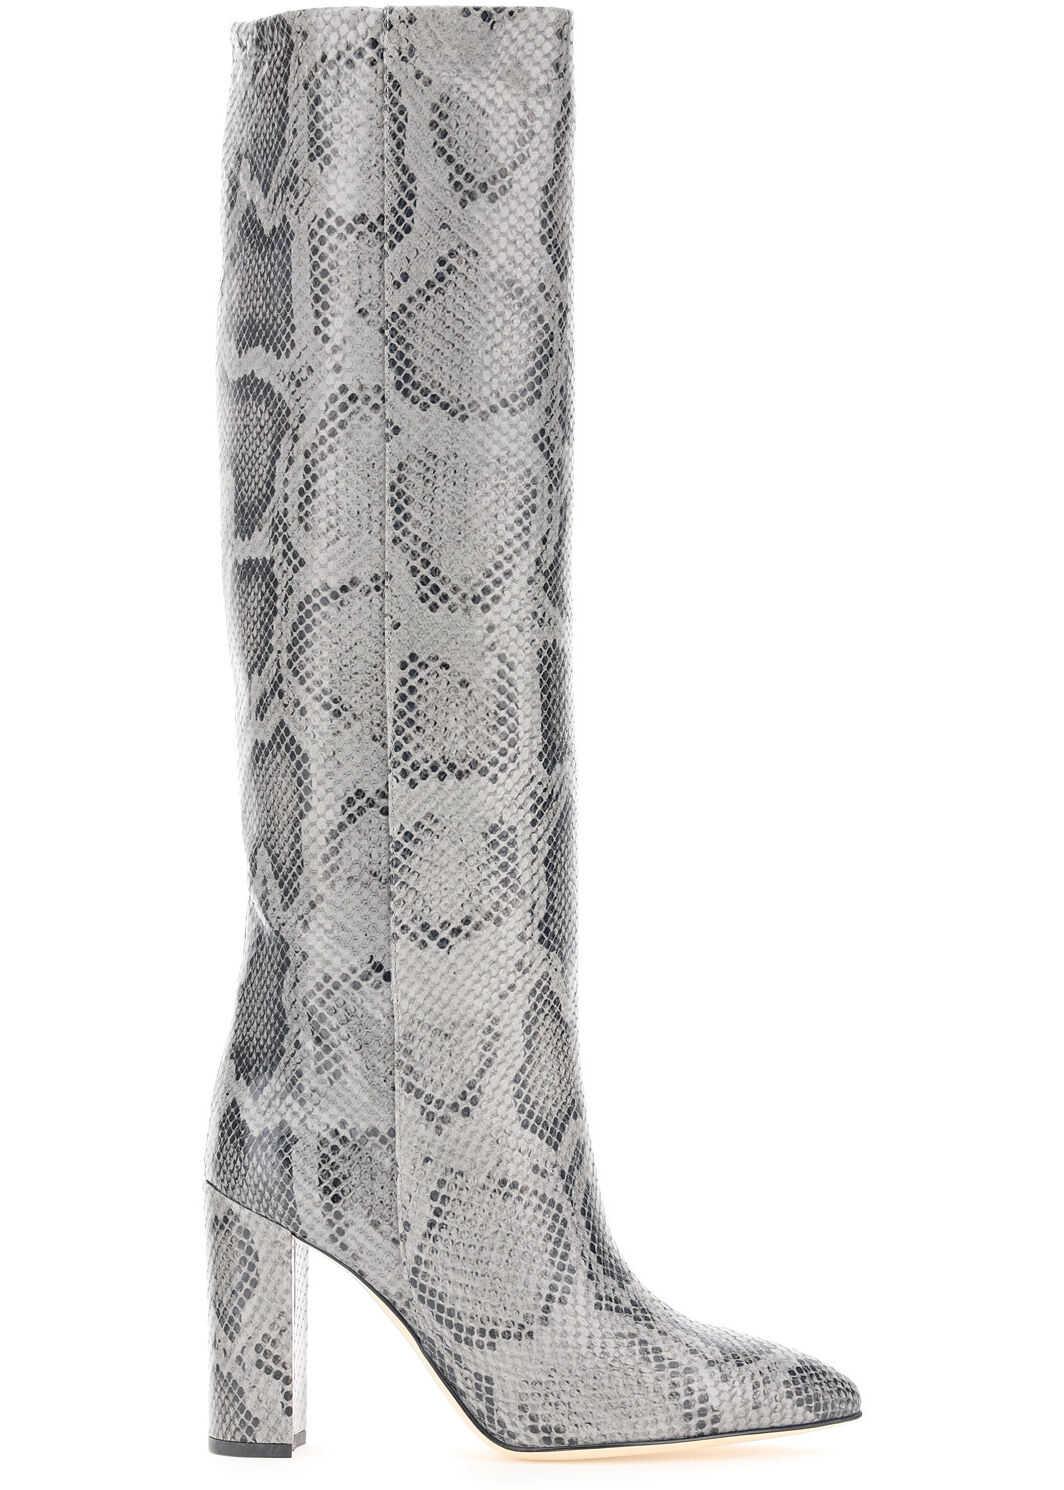 Paris Texas Python-Print Boots PX120 XPMBB GRIGIO imagine b-mall.ro